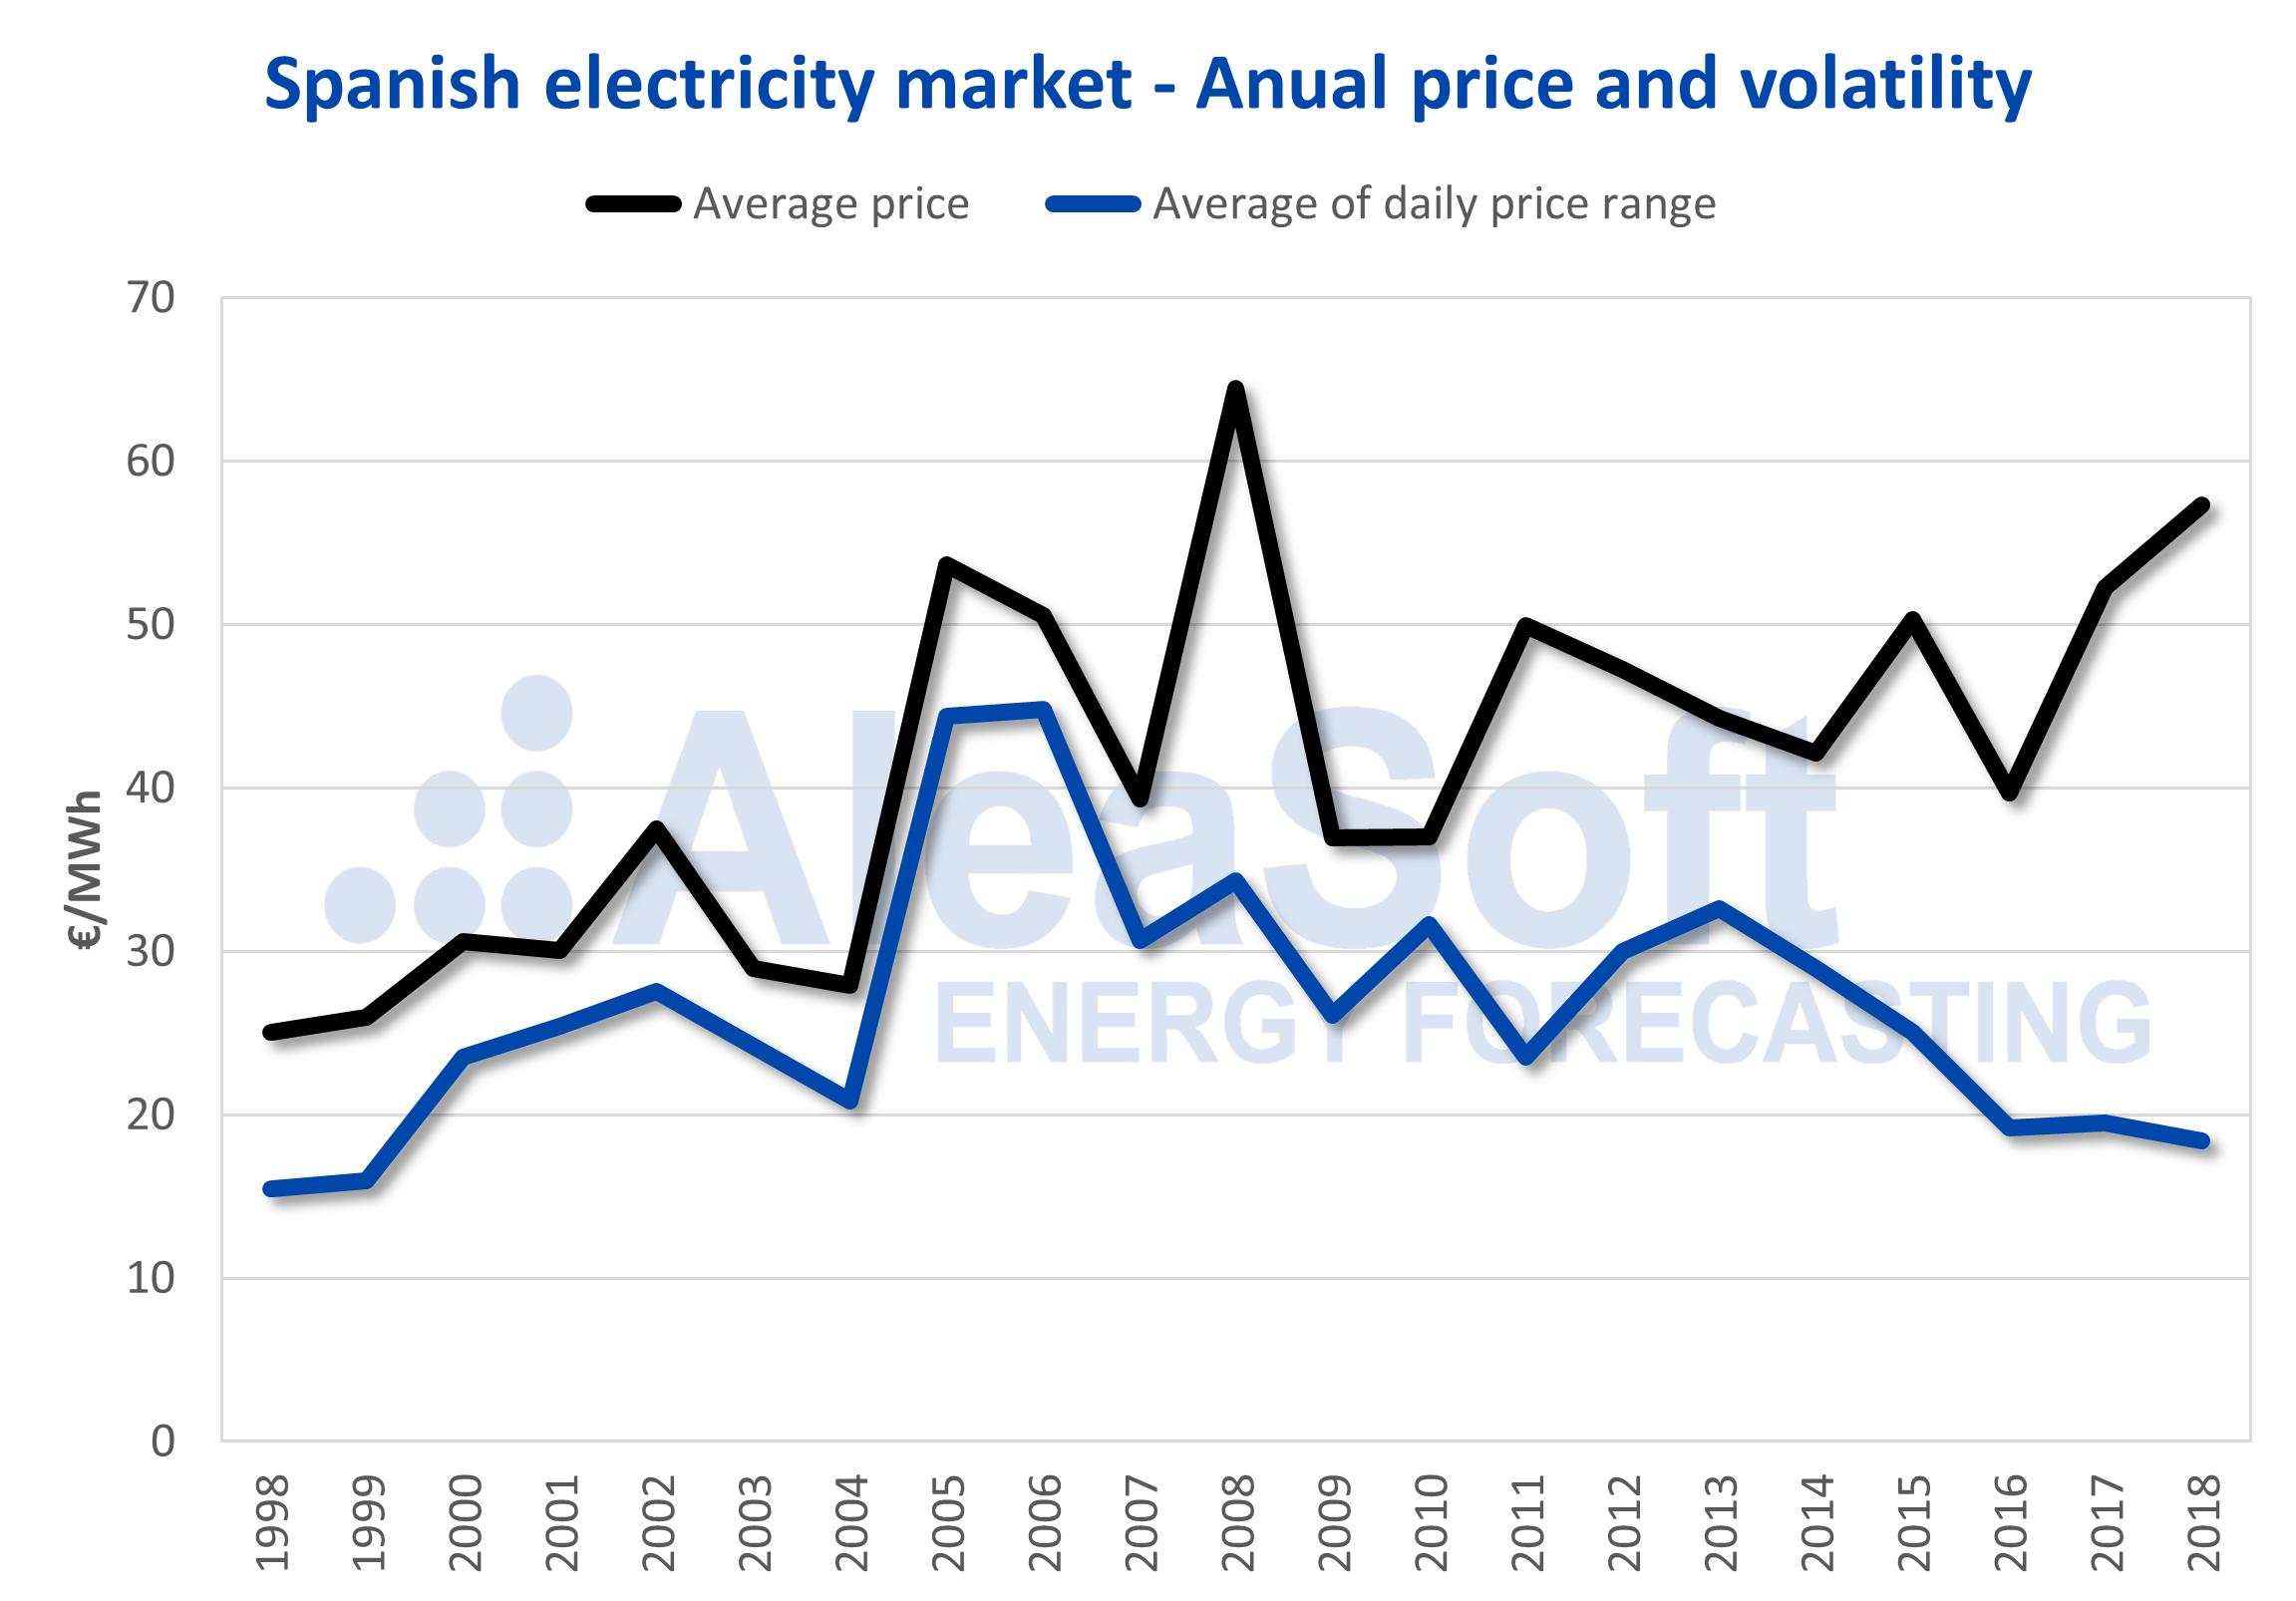 AleaSoft - Spain price range electricity market